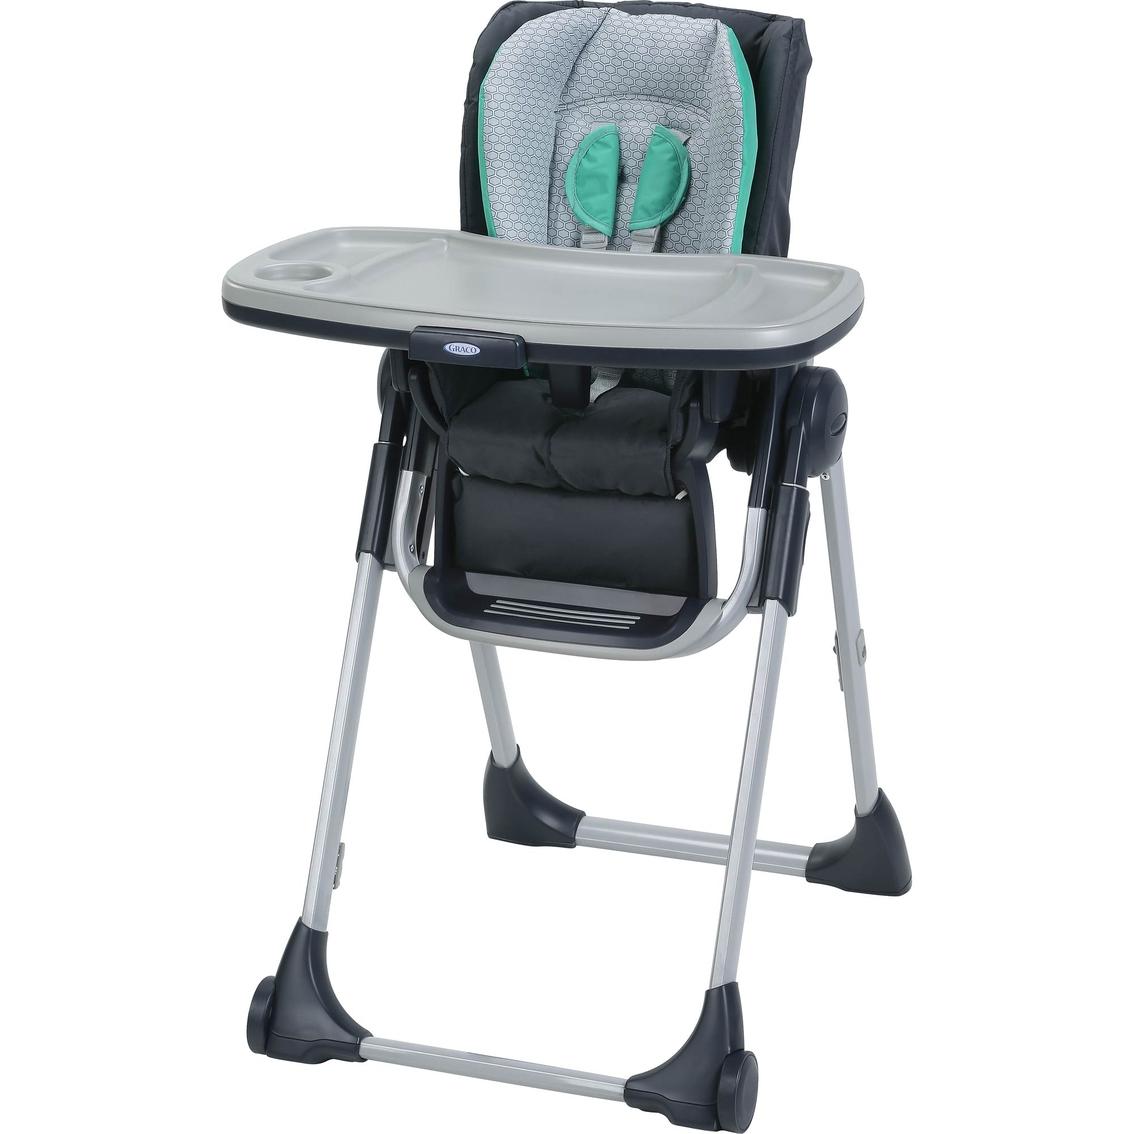 Sensational Graco Swift Fold Lx Highchair Highchairs Baby Toys Alphanode Cool Chair Designs And Ideas Alphanodeonline